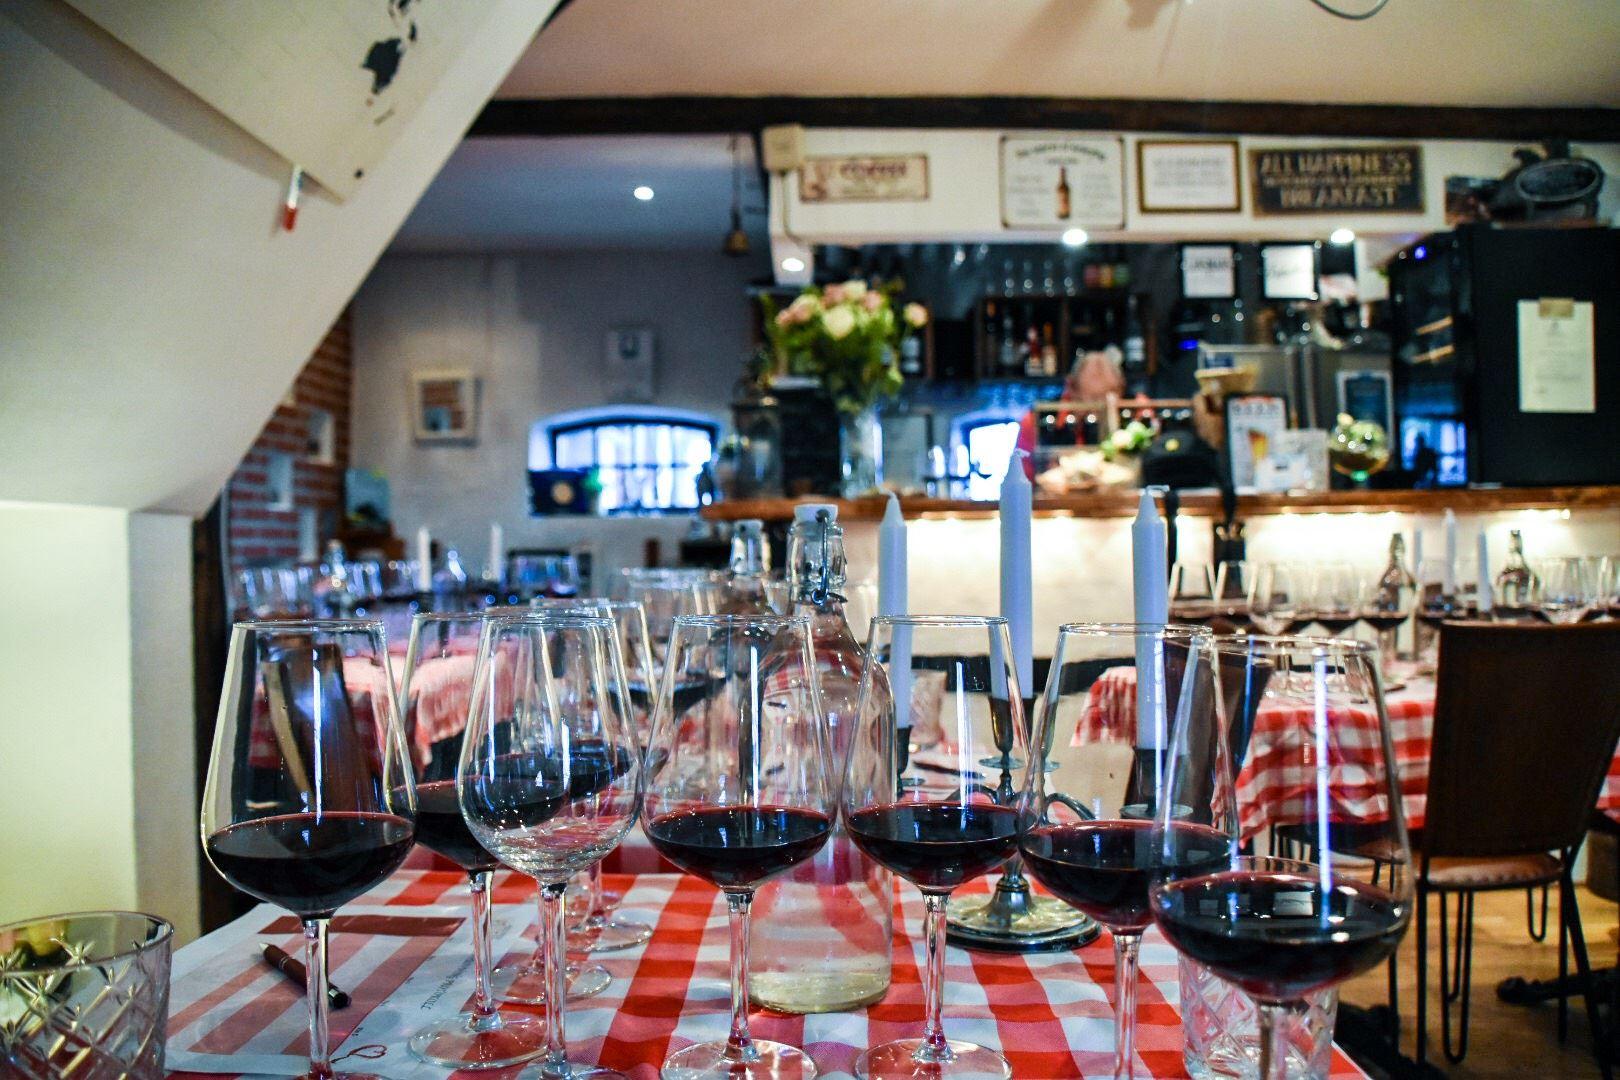 Vinprovning Tema Toscana - Sangiovese experience